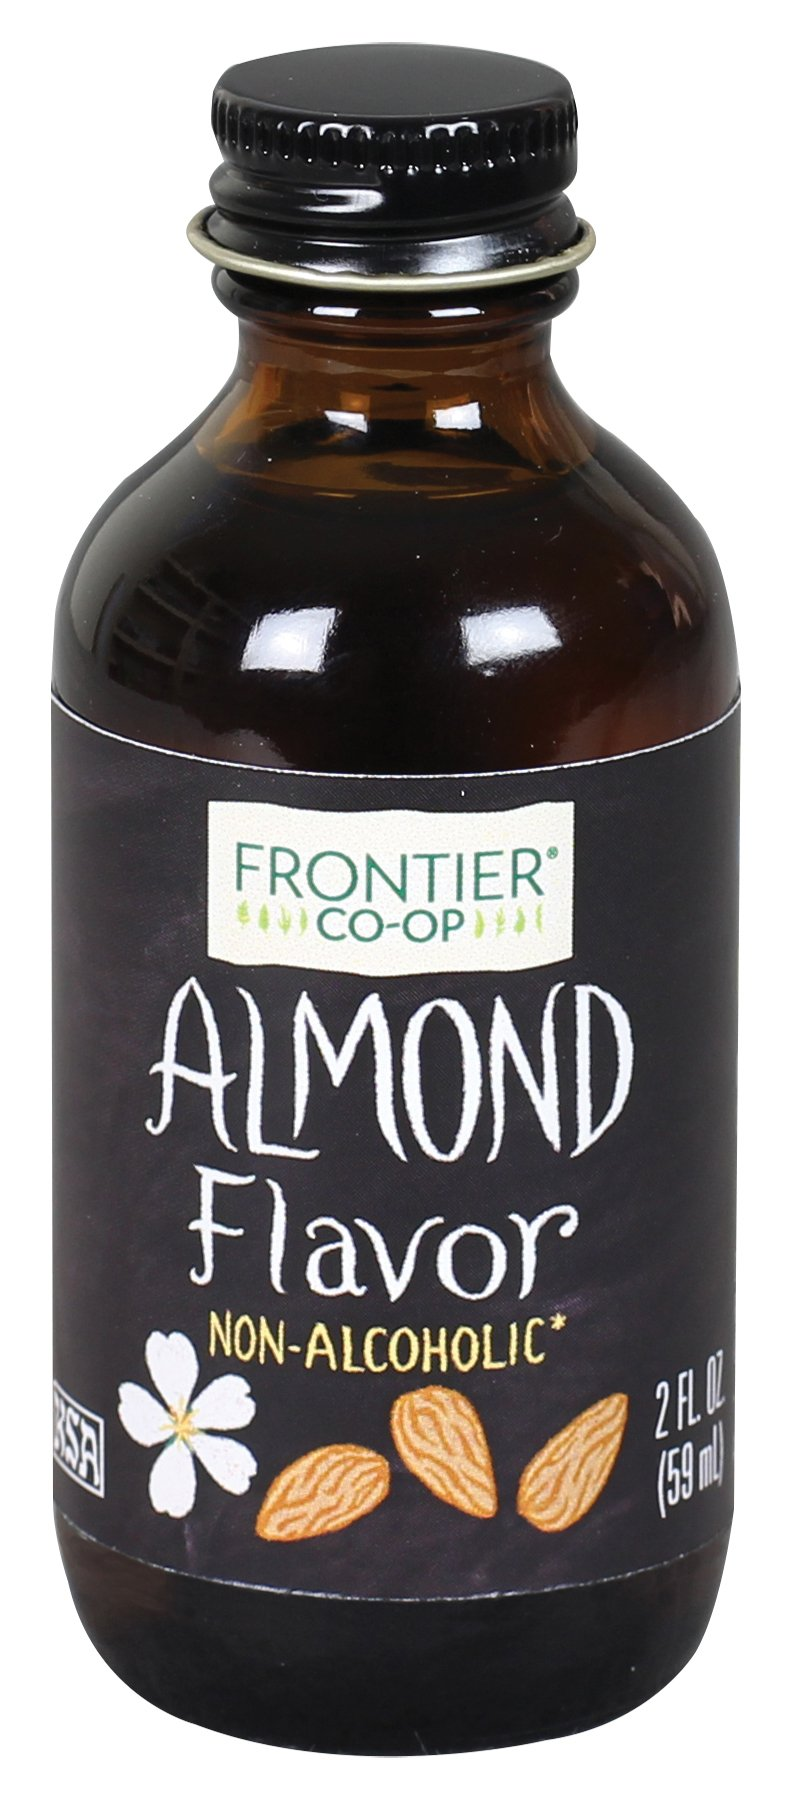 Frontier Co-op Almond Flavor, Non-Alcoholic, 2 ounce bottle